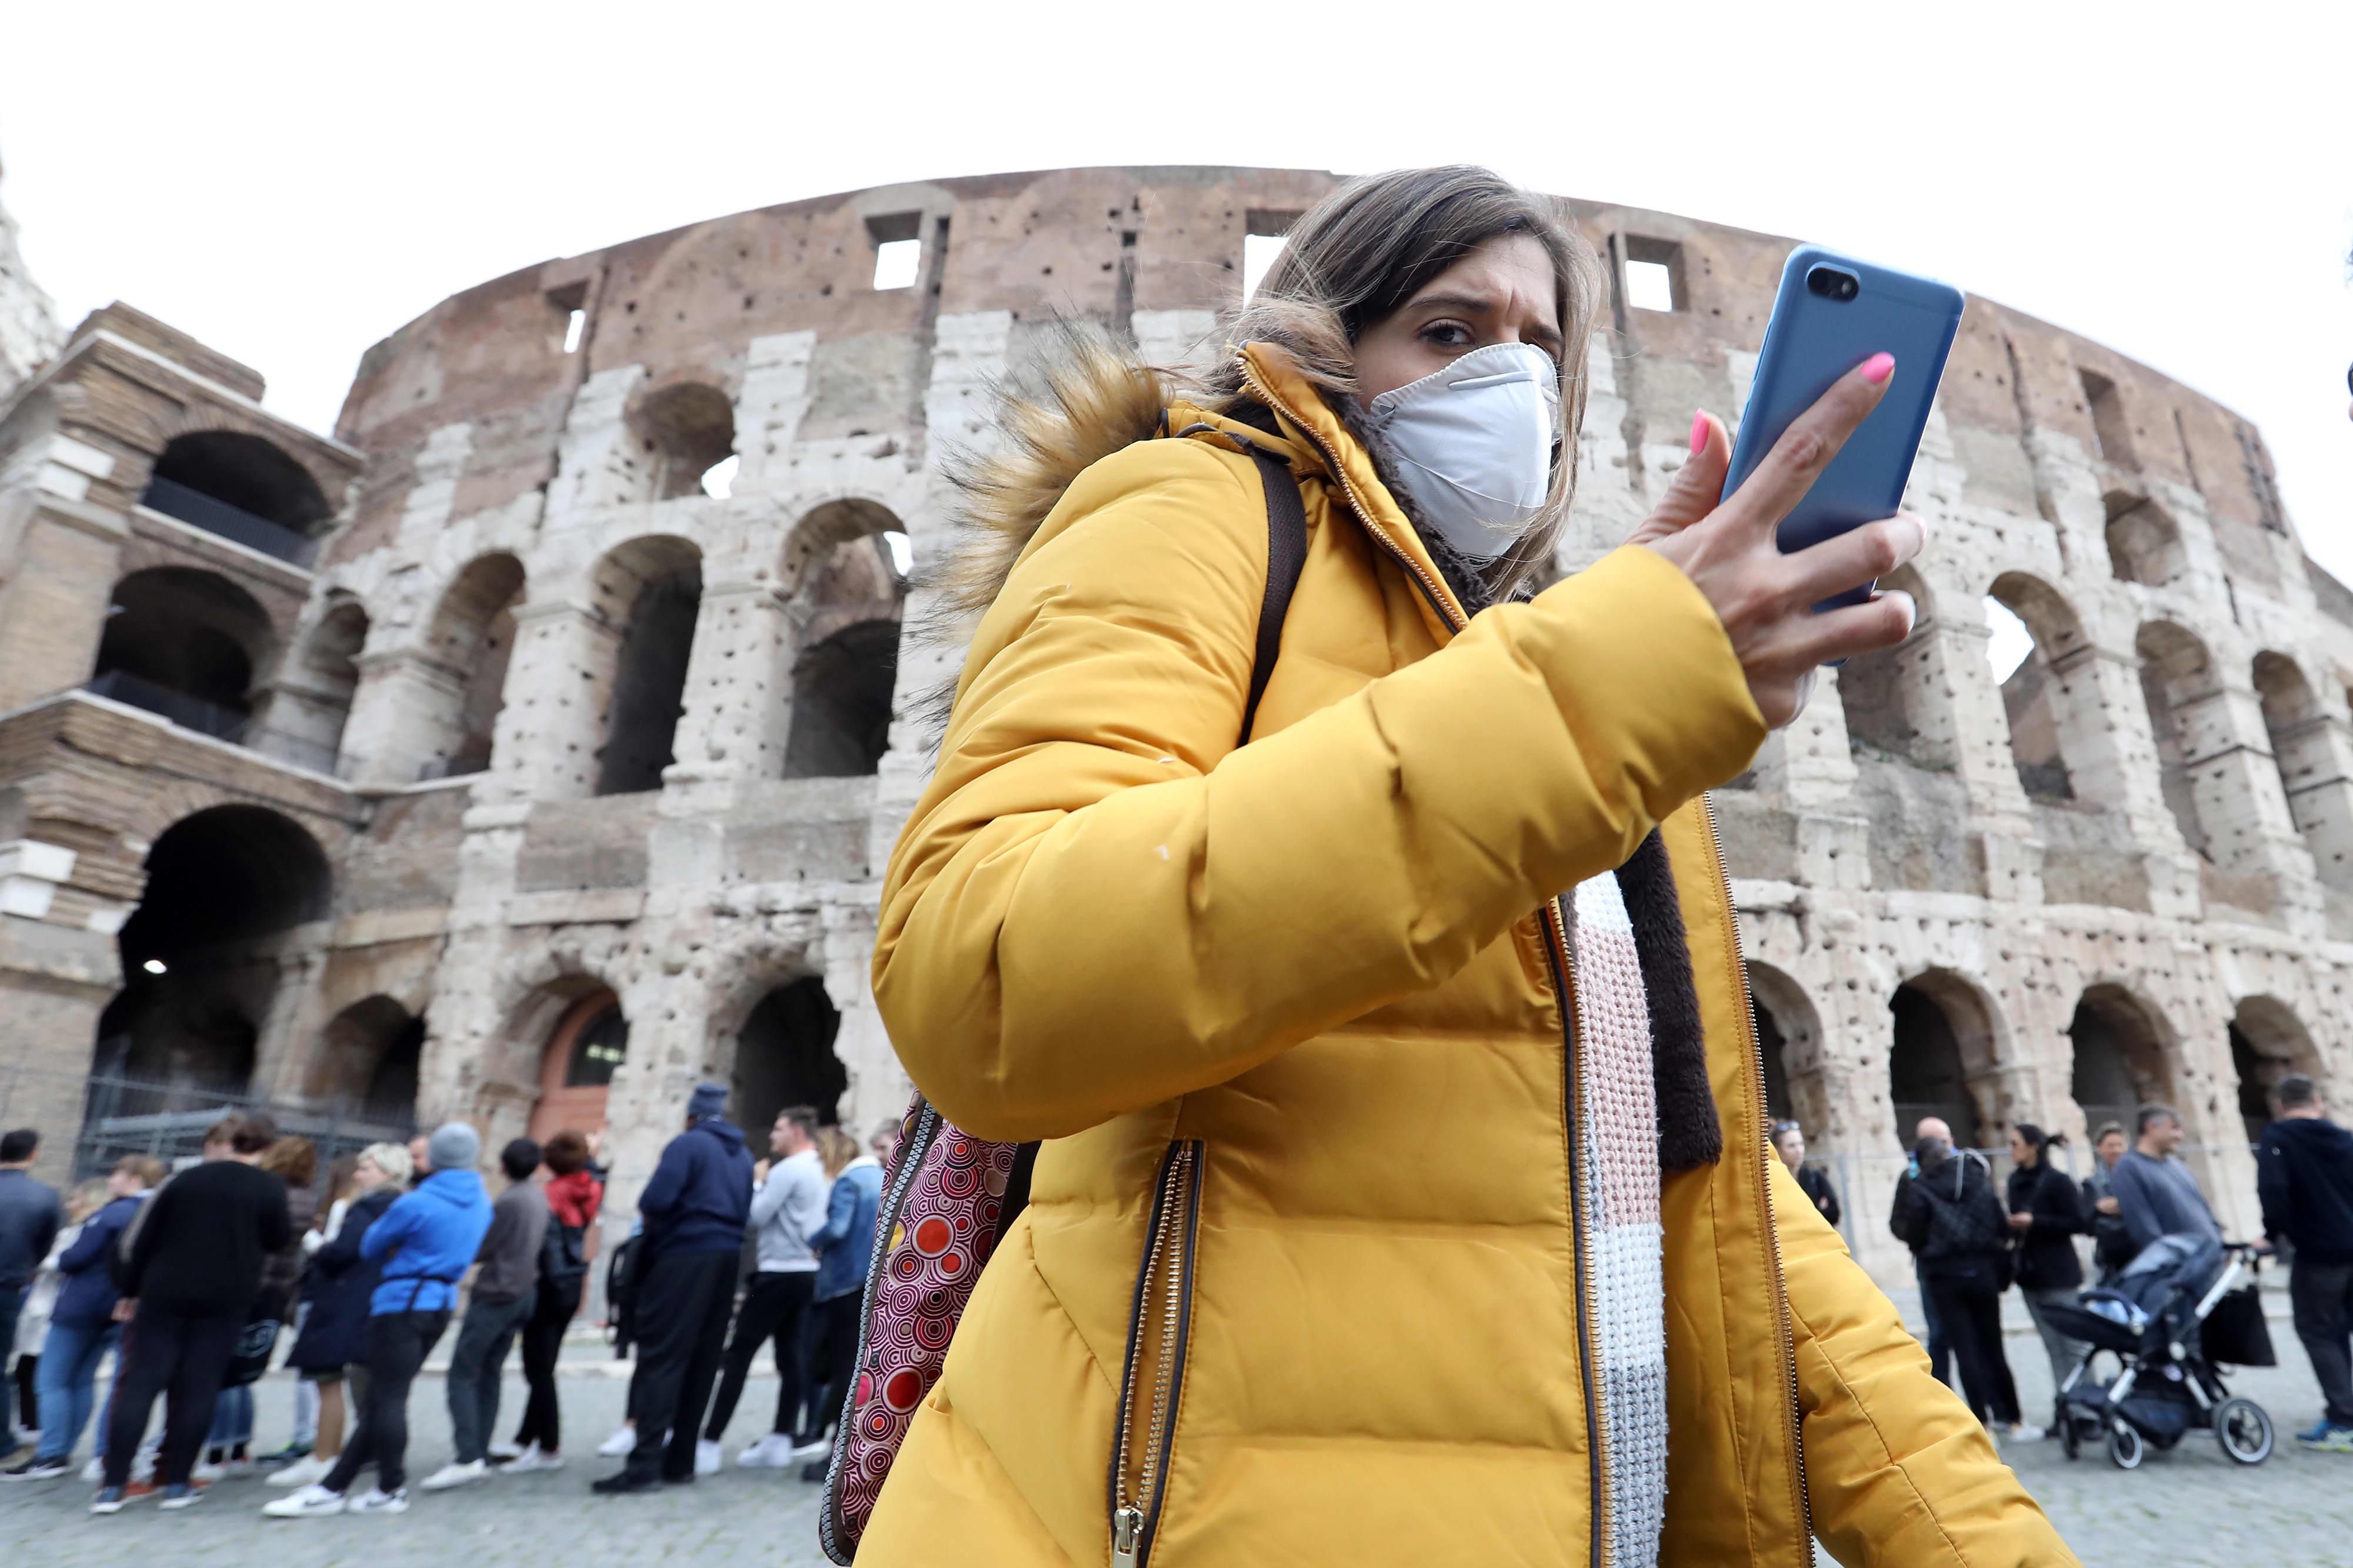 Coronavirus: Next seven days seen as decisive for Italy